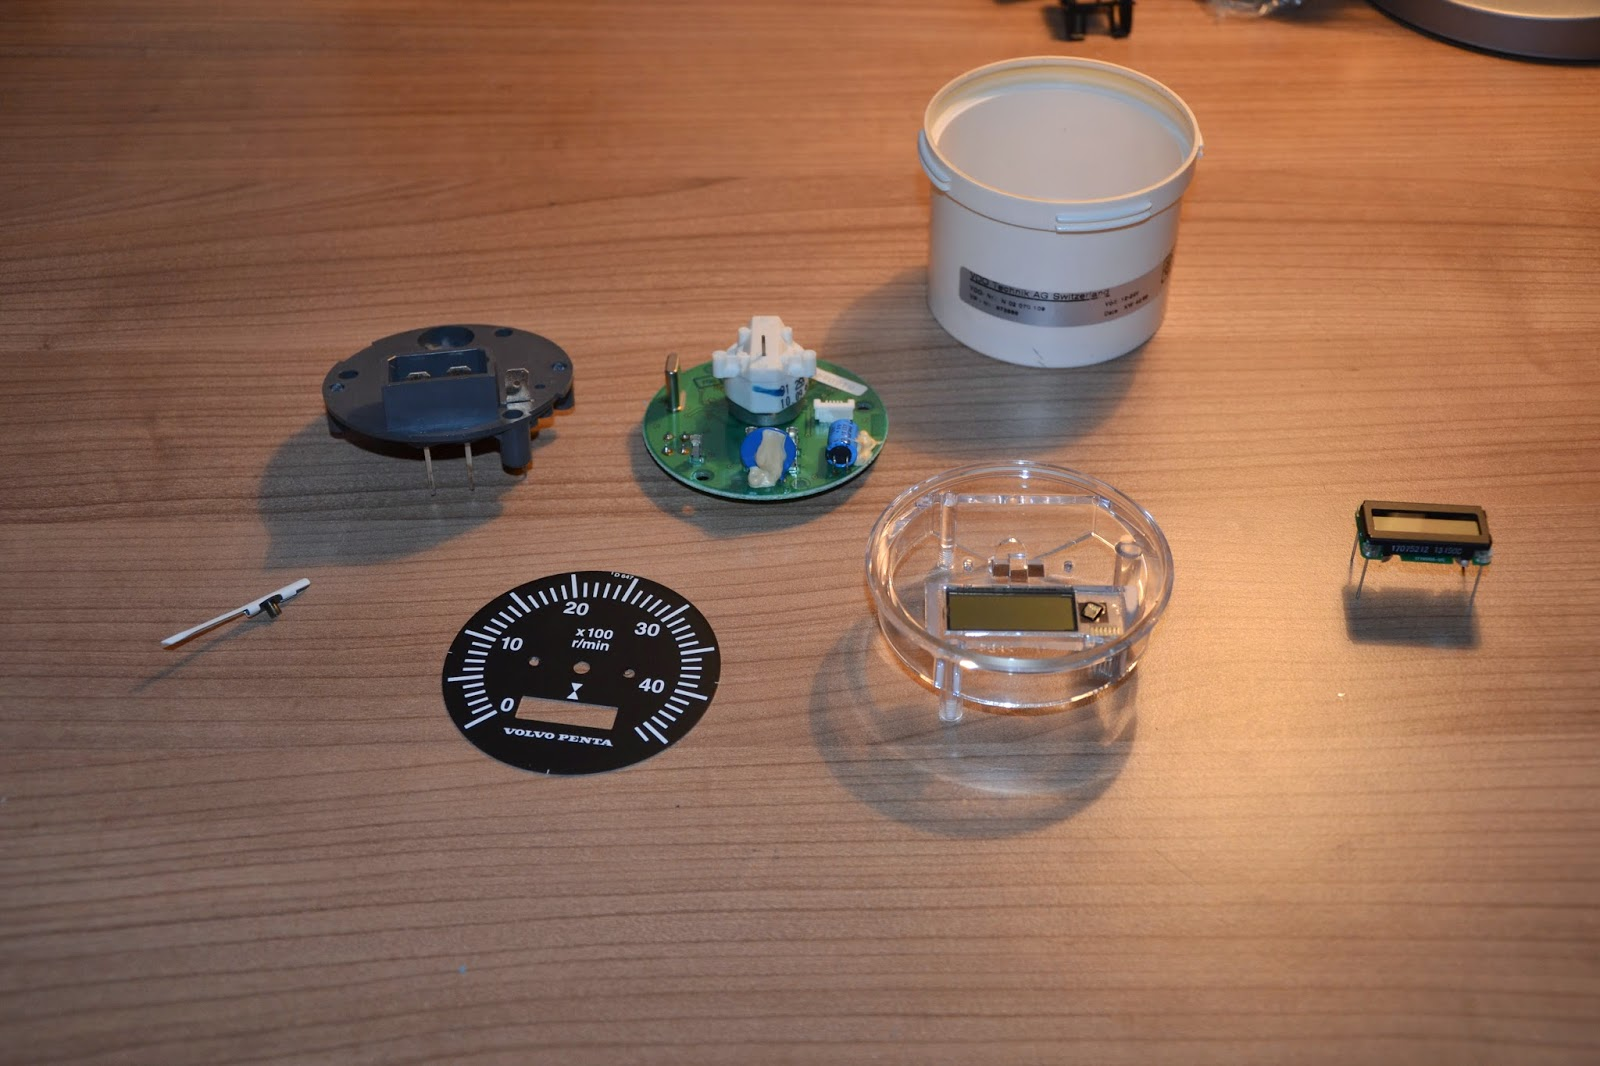 vdo tachometer with hour meter wiring diagram 2002 chevrolet impala radio we sail phobos 21 replace volvo penta lcd